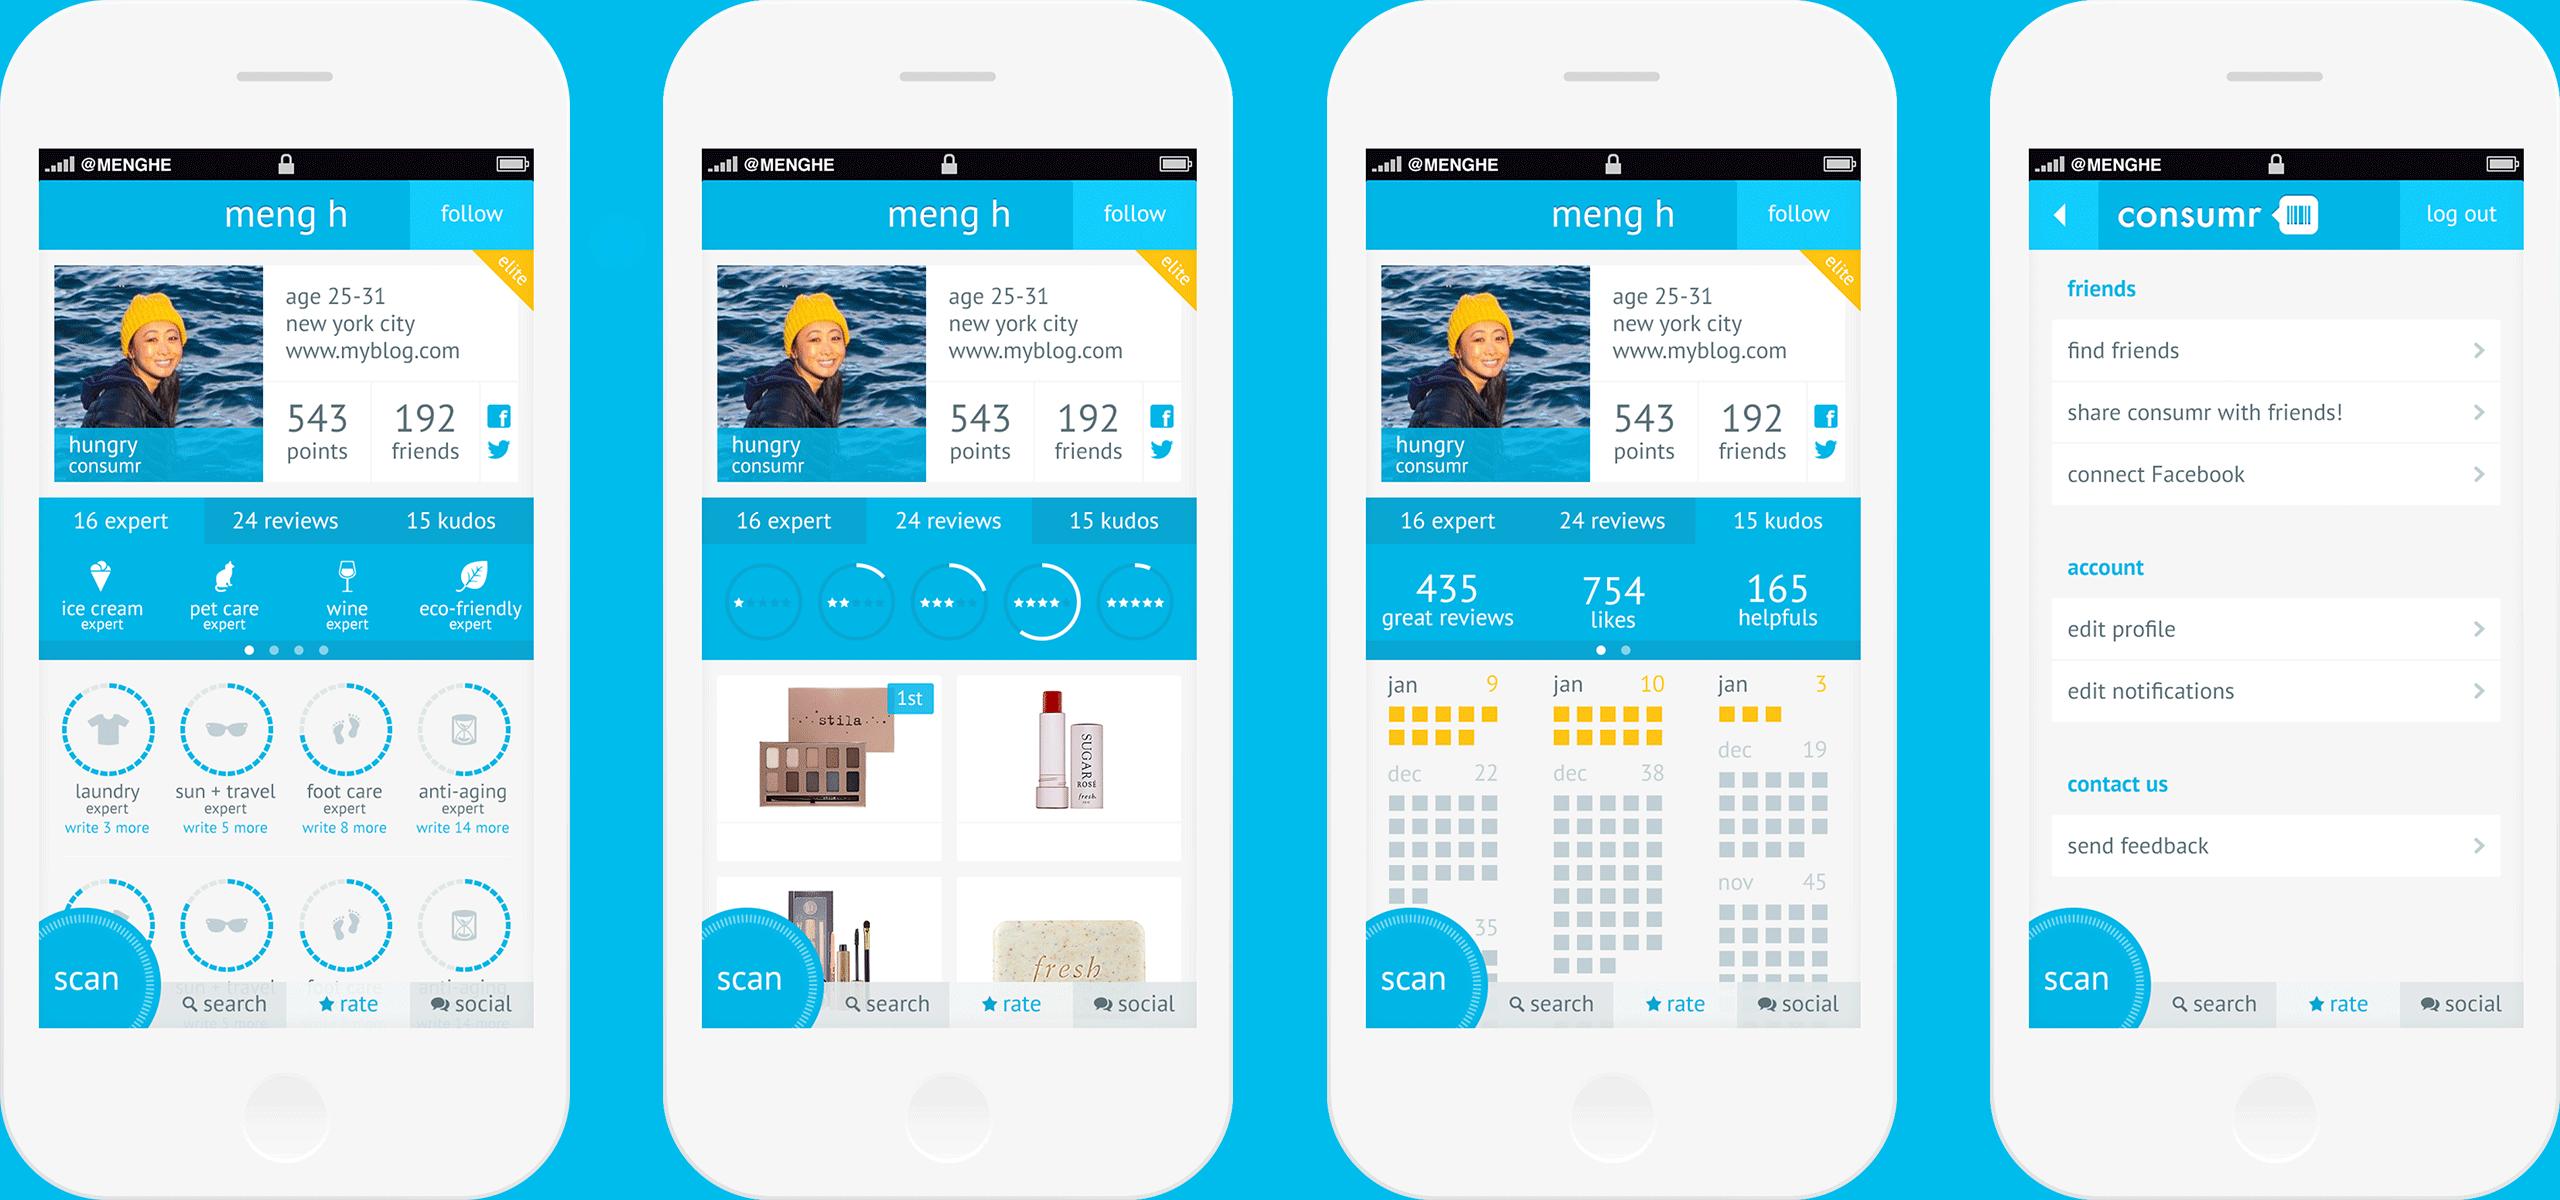 meng-he-consumr-final-app-design-profile